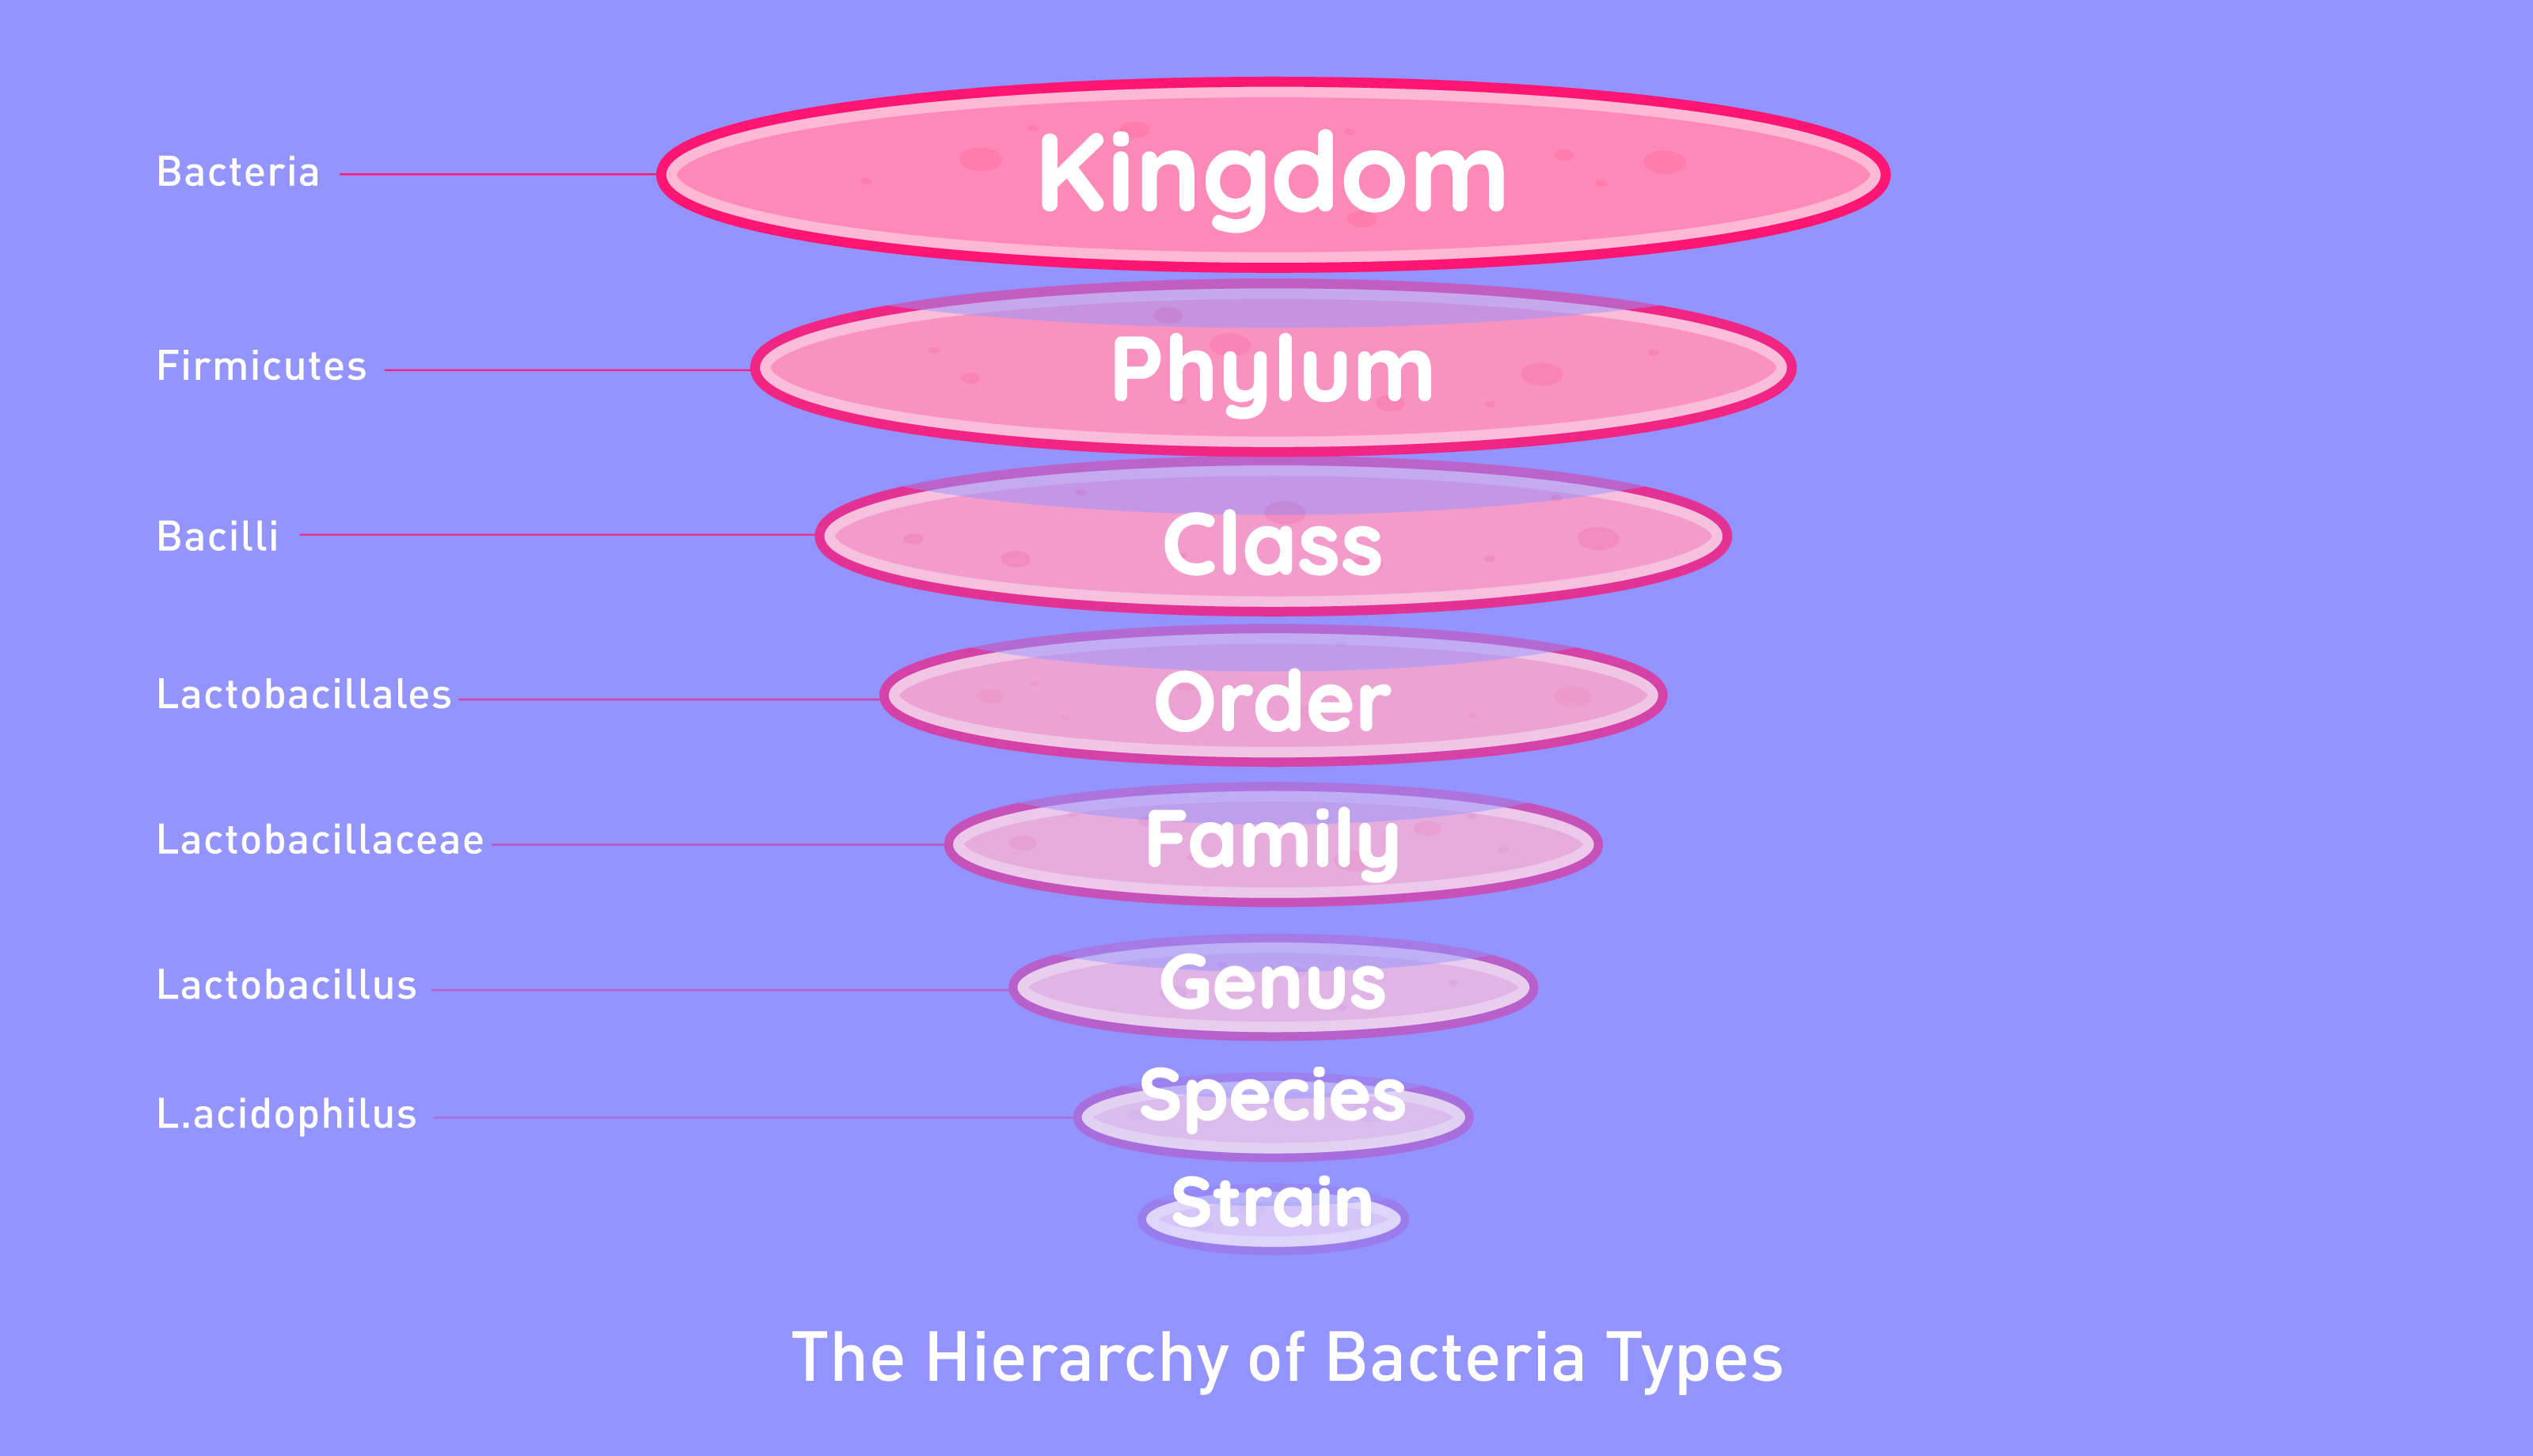 Firmicutes phylum.